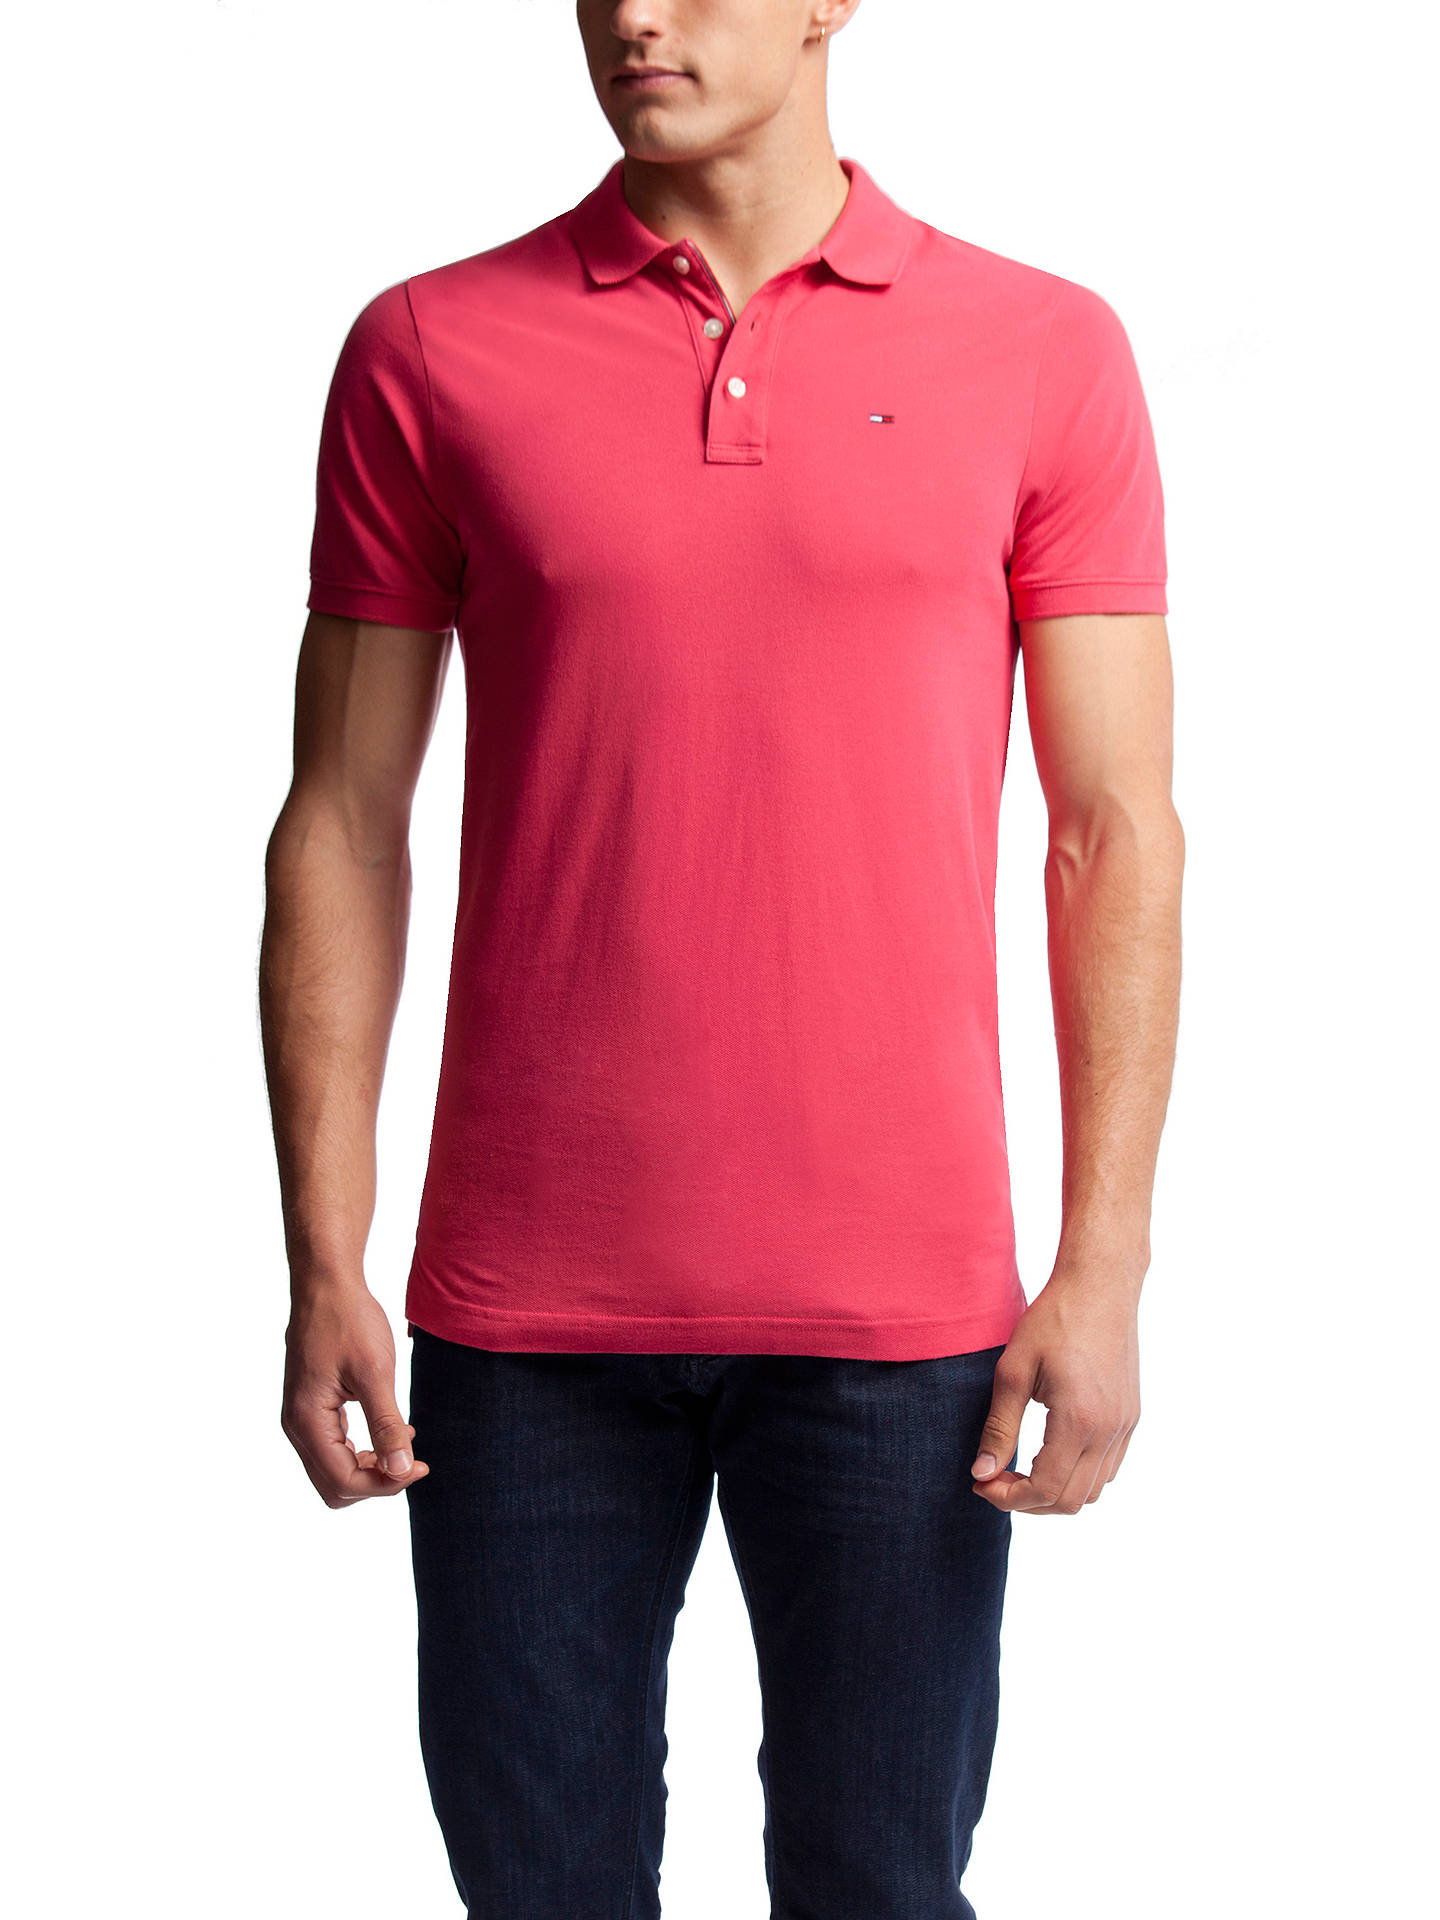 Tommy Hilfiger Basic Cotton Pique Polo Shirt At John Lewis Partners